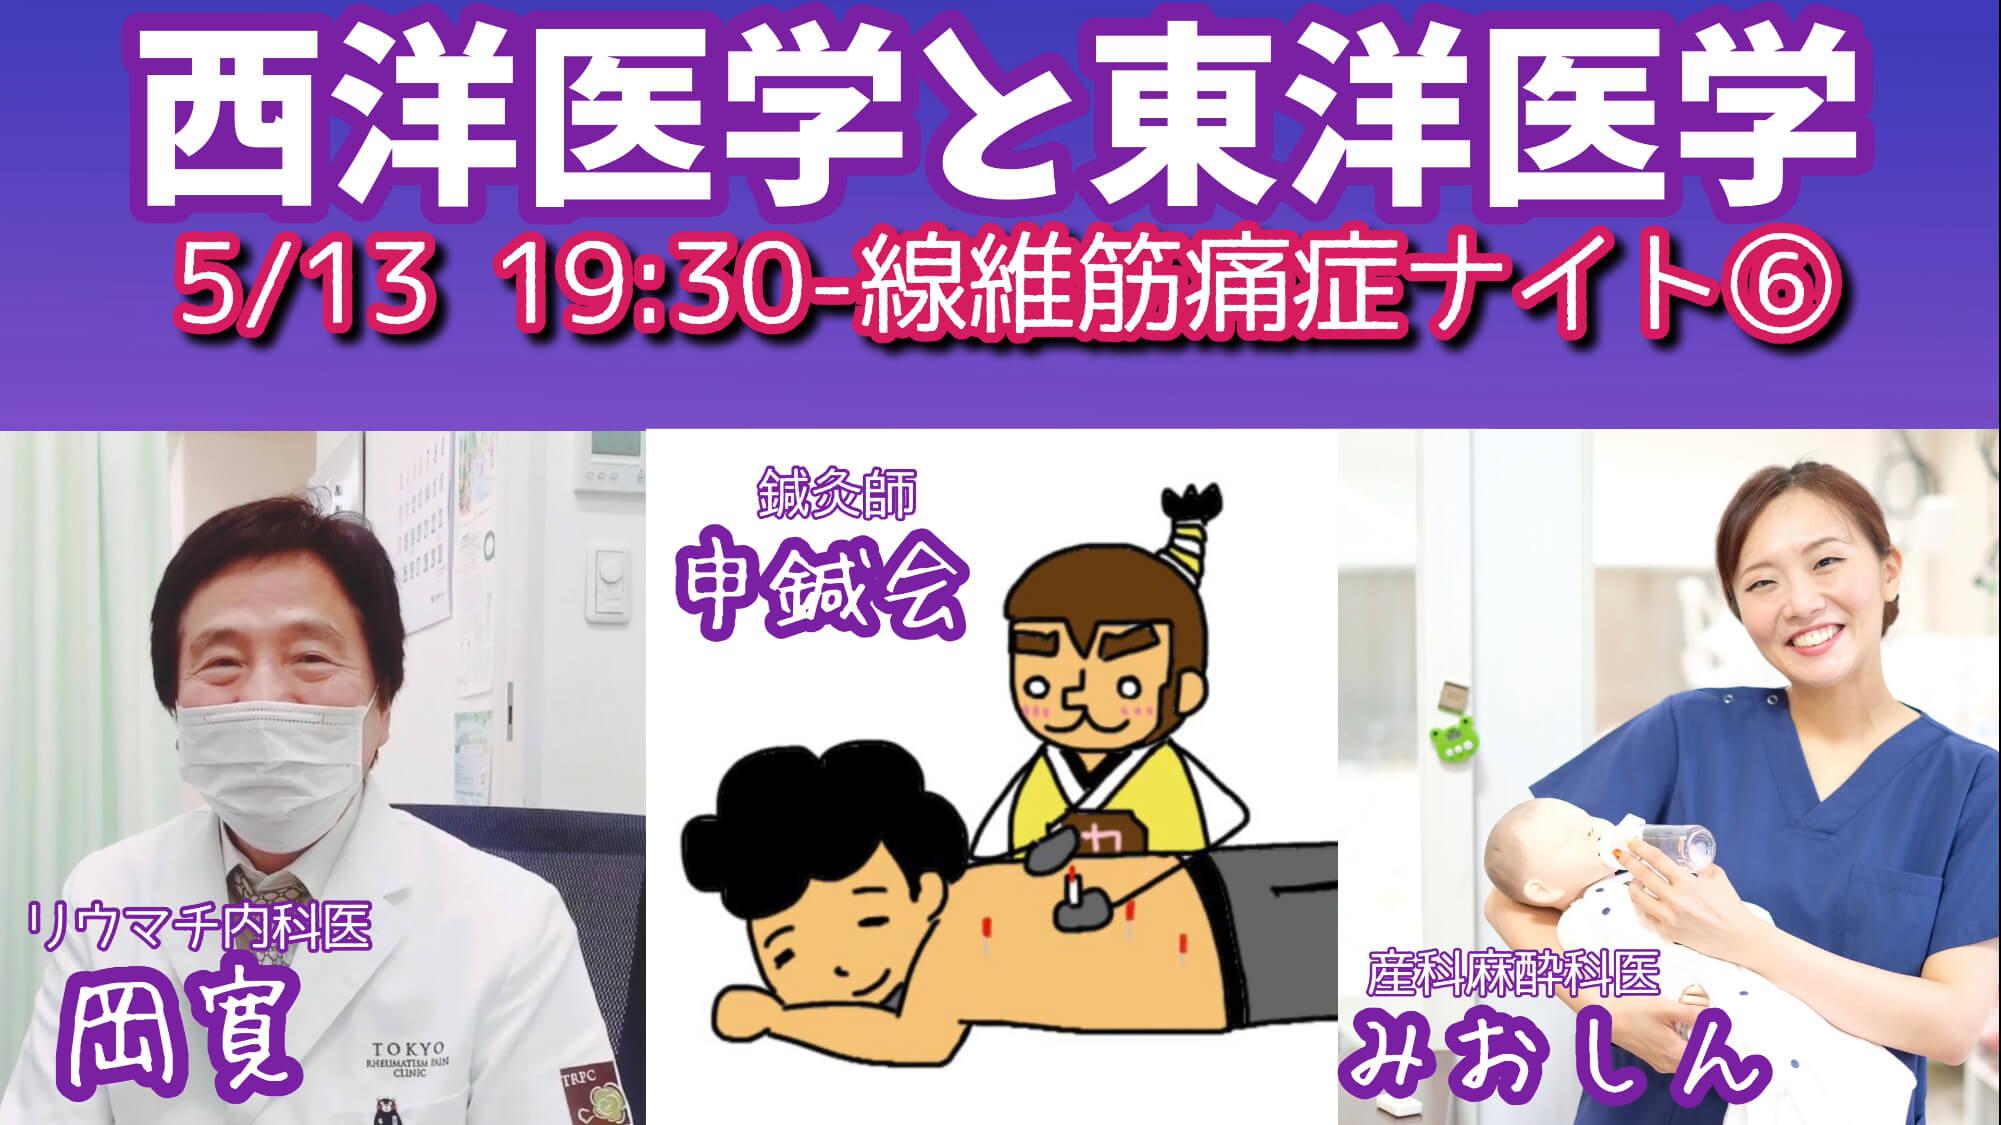 YouTube配信「線維筋痛症ナイト⑥」に岡医師が出演します。